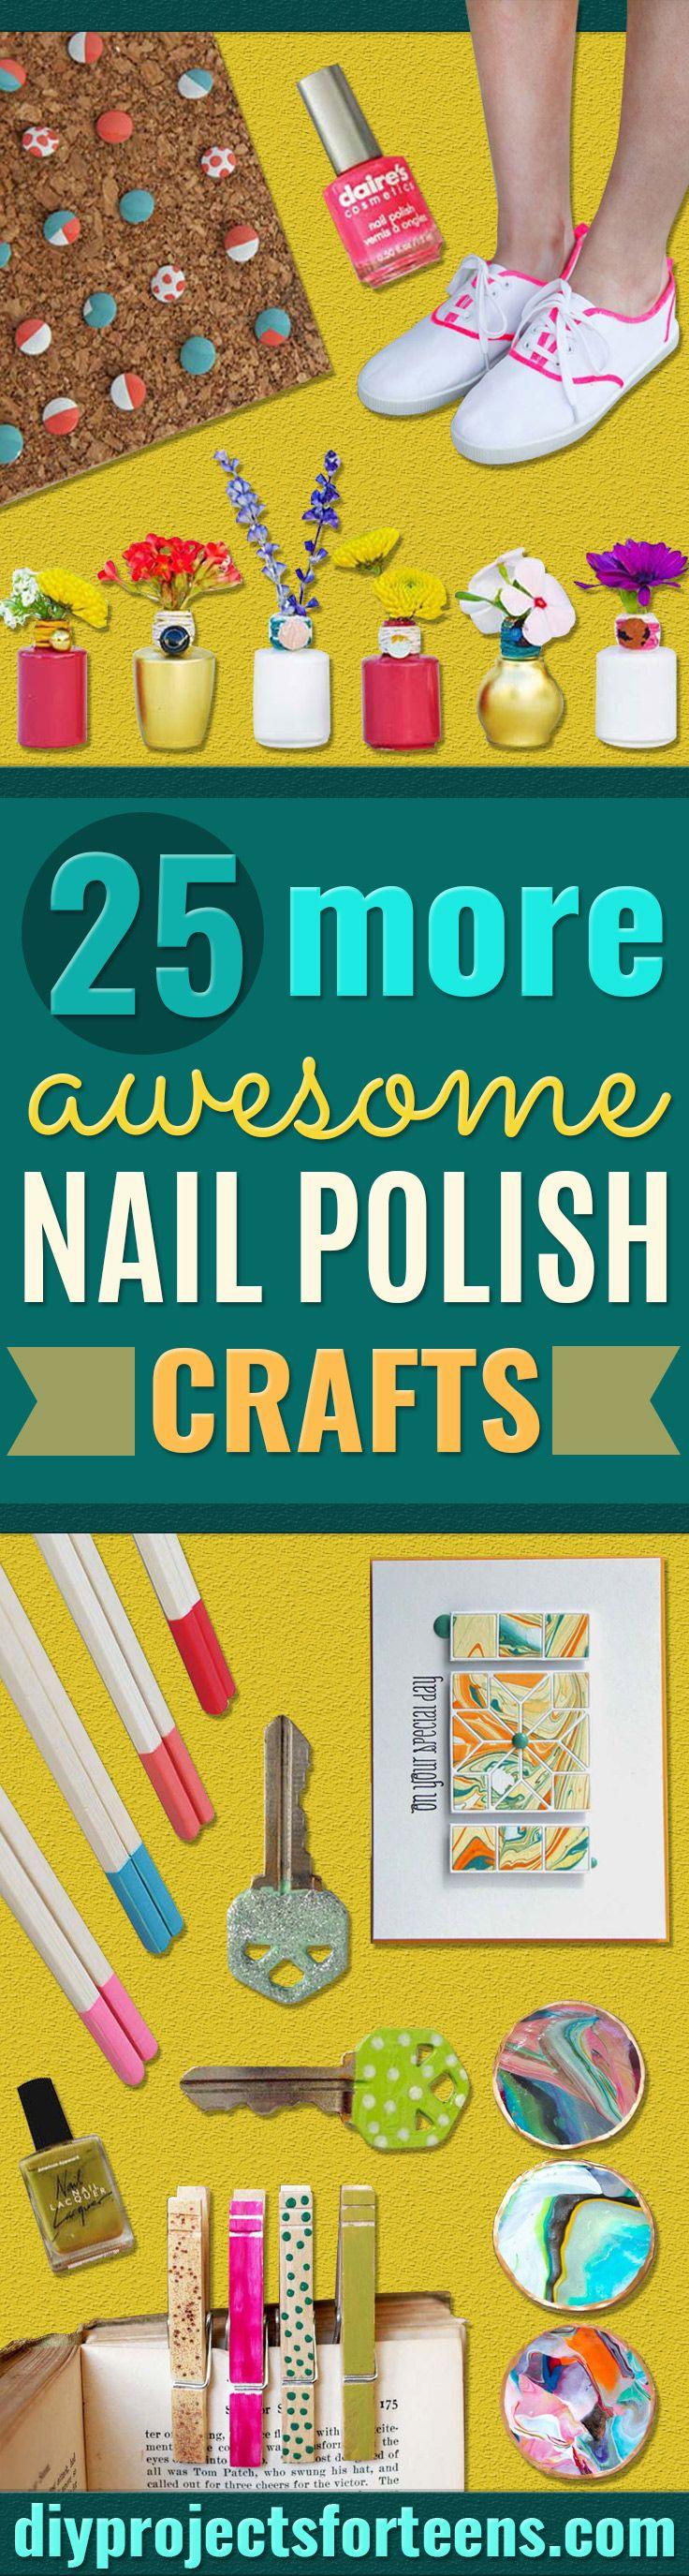 25 More Awesome Nail Polish Crafts